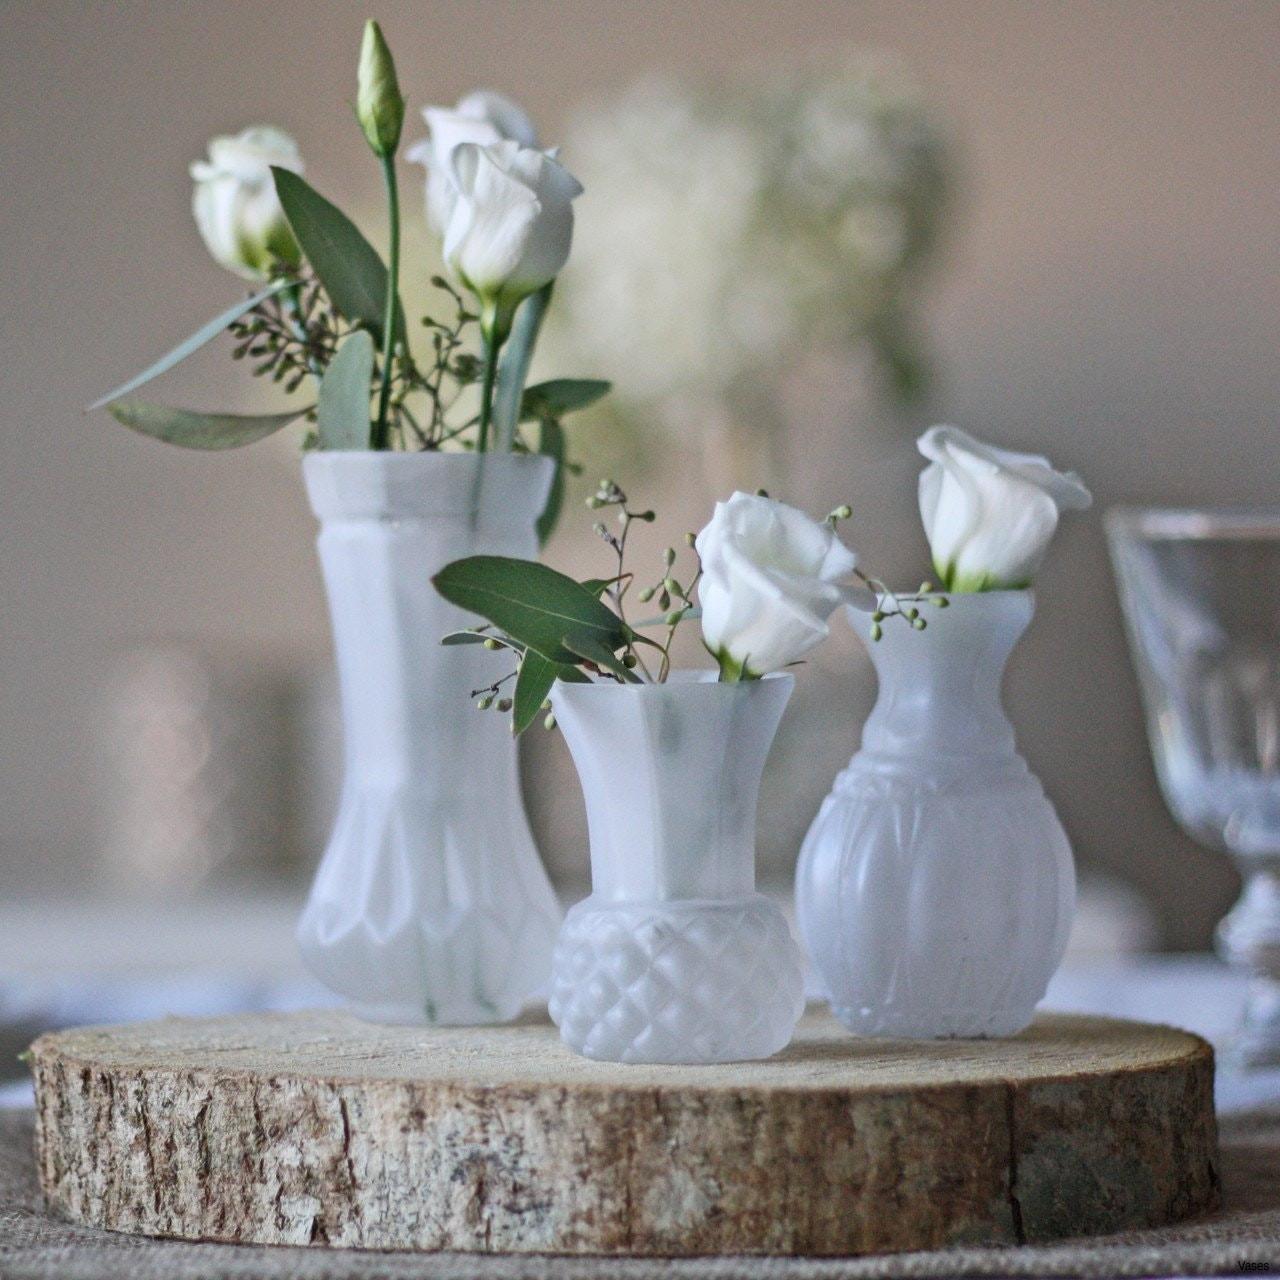 white ceramic pitcher vase of white bud vases photos jar flower 1h vases bud wedding vase regarding white bud vases photos jar flower 1h vases bud wedding vase centerpiece idea i 0d white